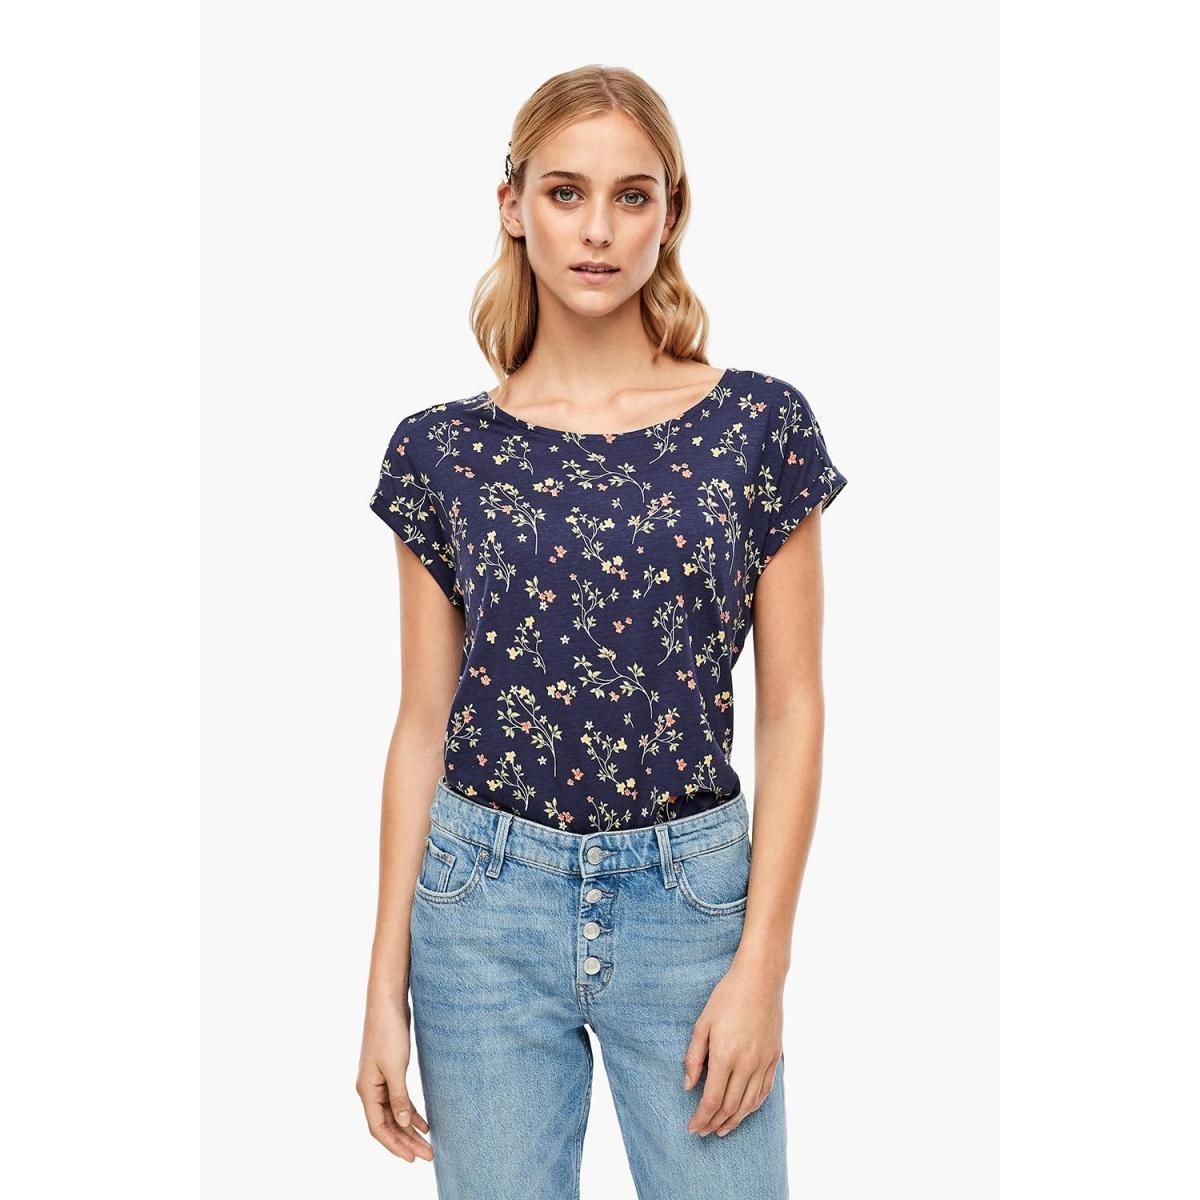 t shirt met jungle patroon 05006325349 s.oliver t-shirt 58b3